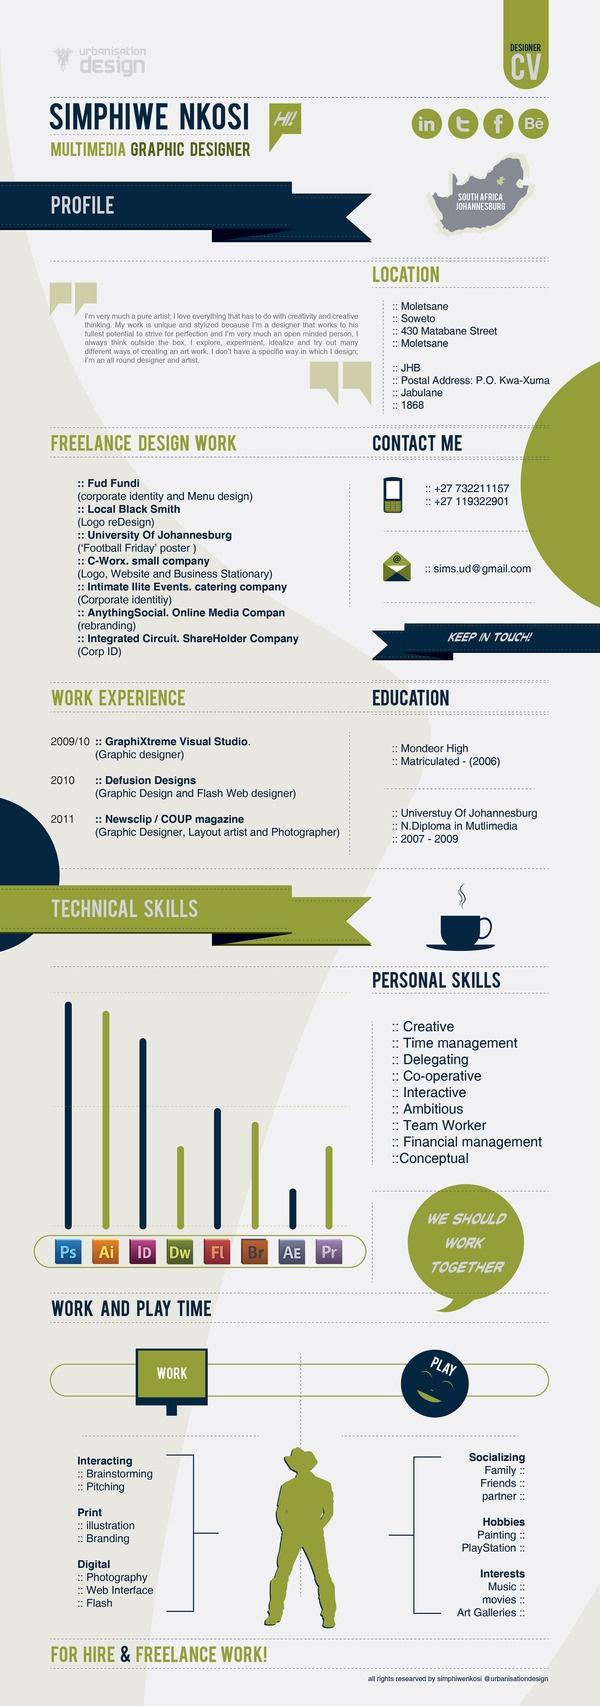 designer cv infographic by simphiwe nkosi via behance